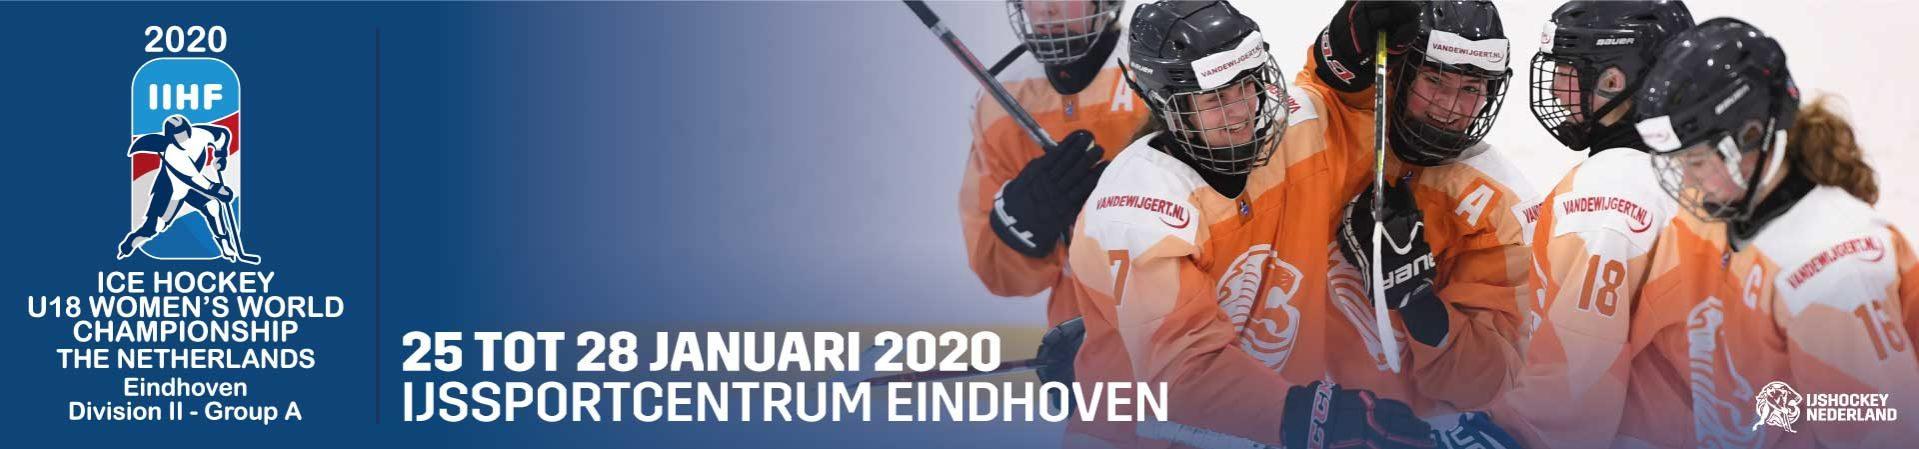 WK IJshockey Dames U18 Ticketverkoop